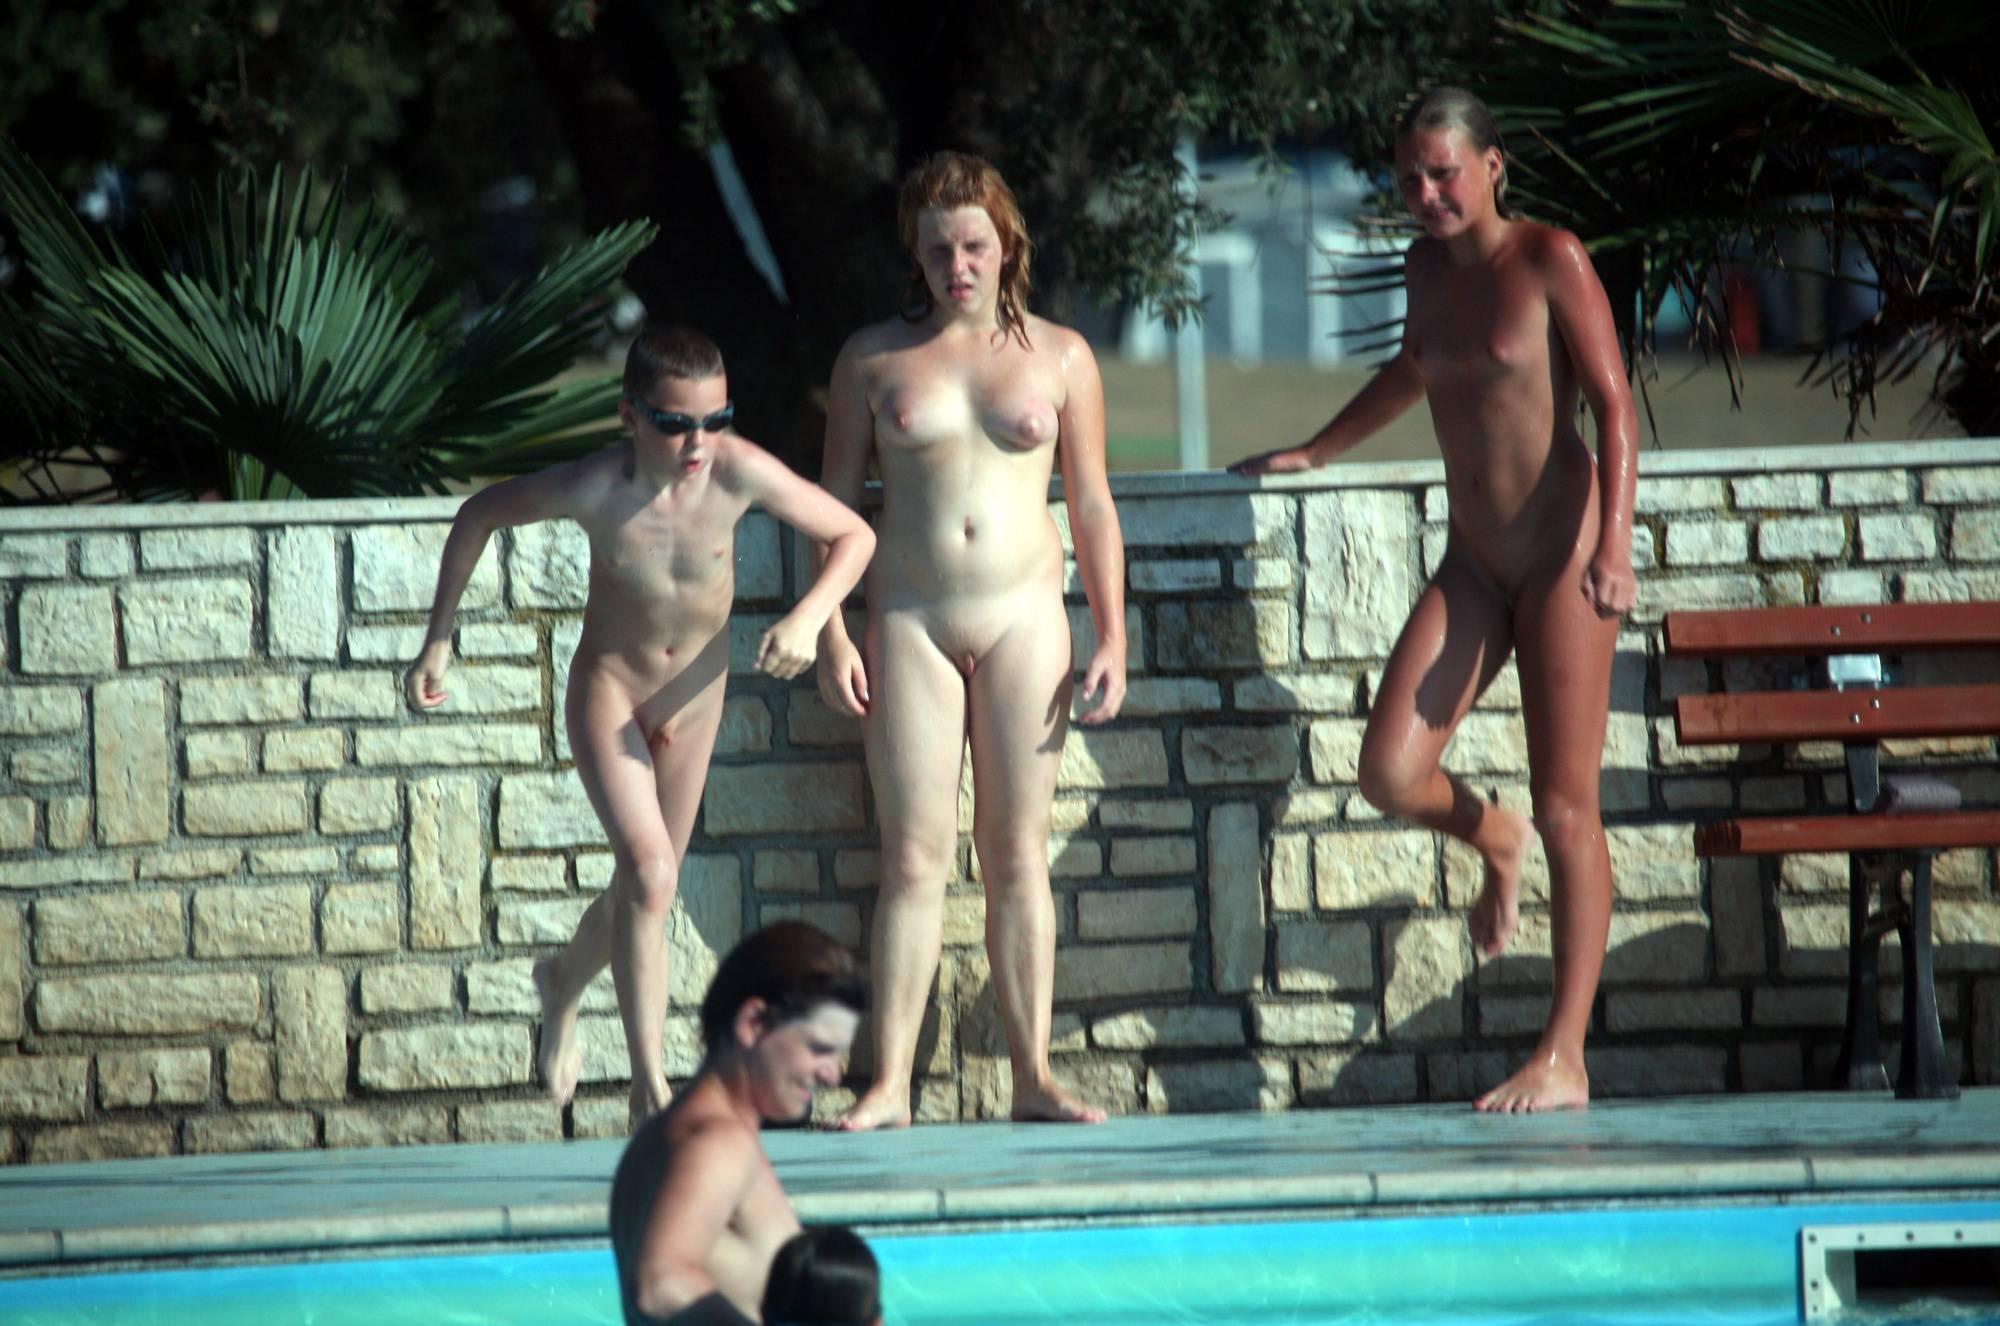 Purenudism Images Nudist Pool Group Gather - 1